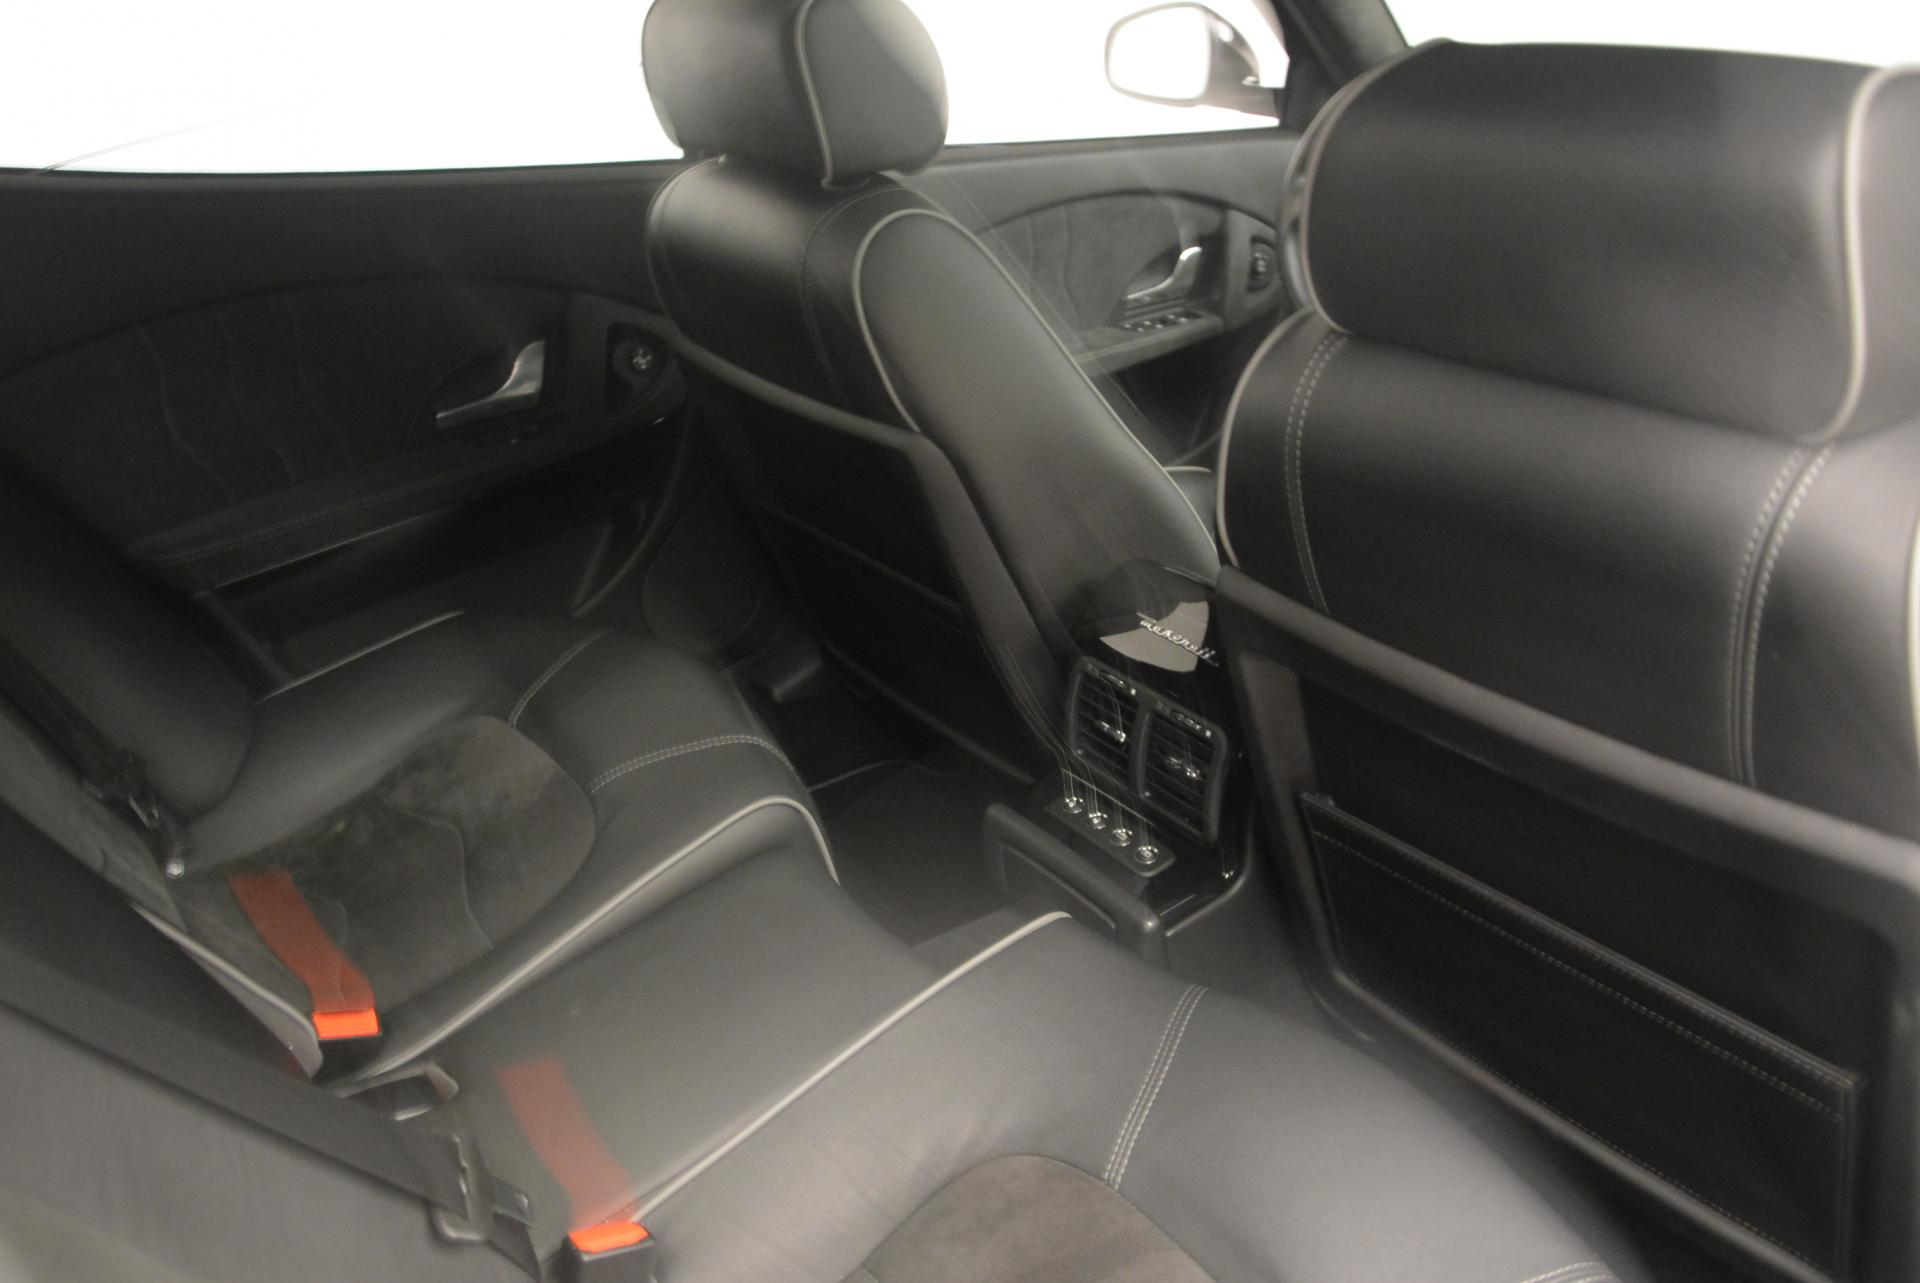 Used 2011 Maserati Quattroporte Sport GT S For Sale In Westport, CT 531_p26